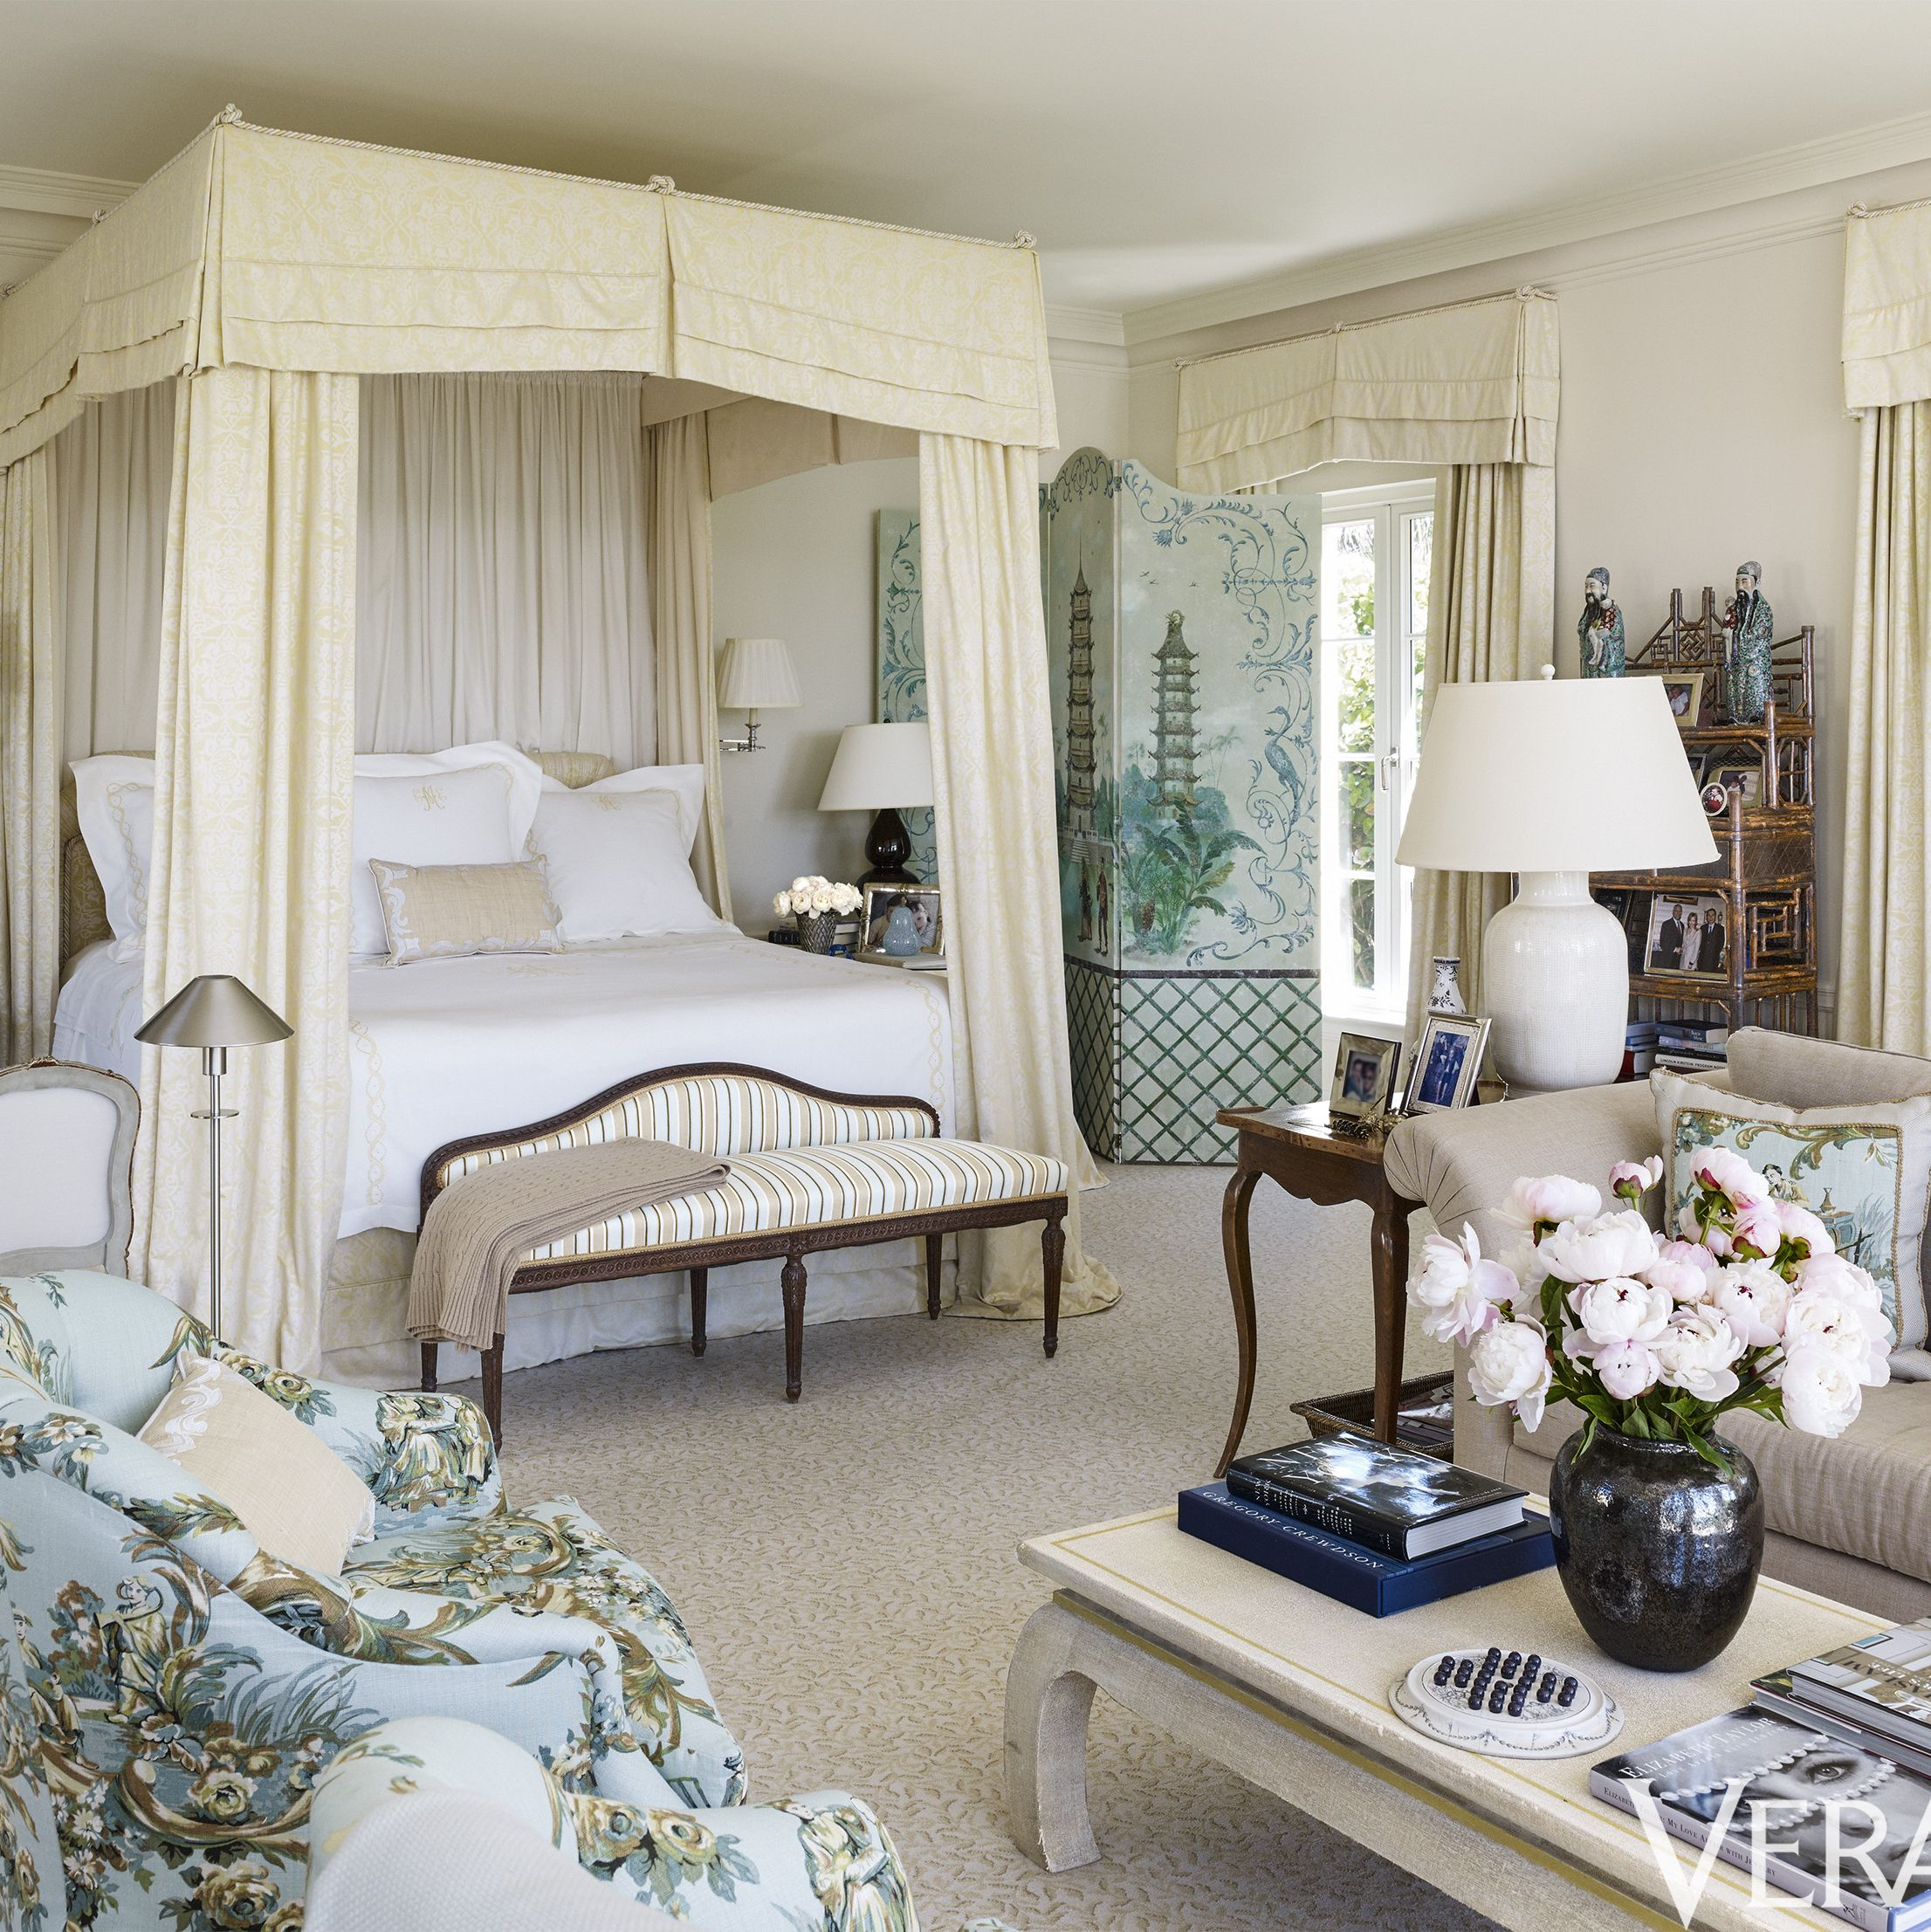 Homes rooms 30 best bedroom decor ideas